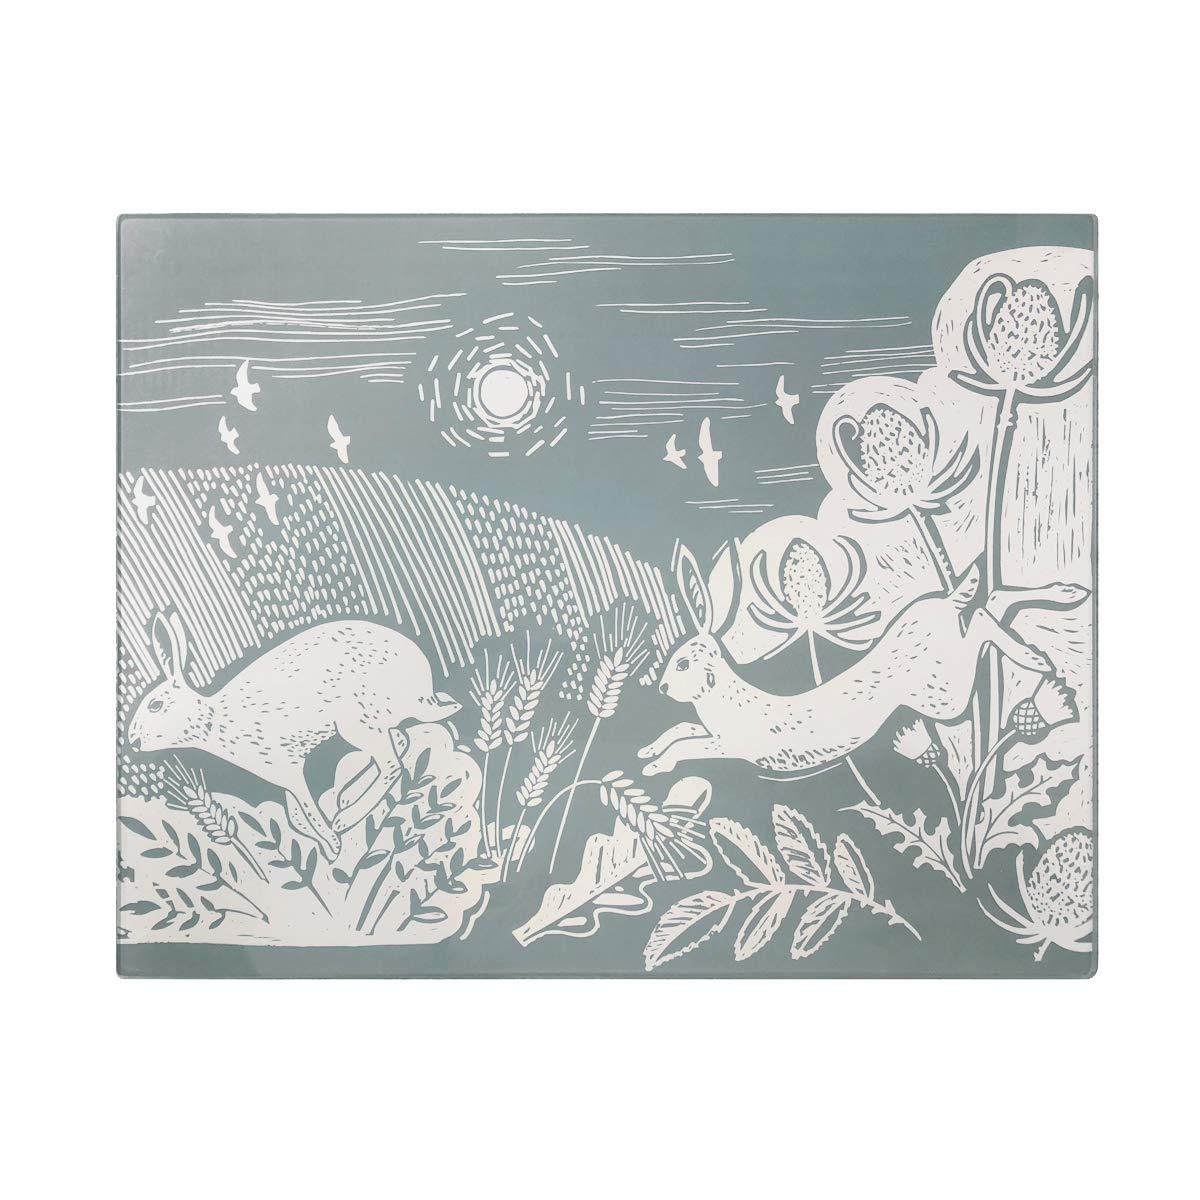 English Tableware Co. Artisan Hare Toughened Glass Worktop Saver, 40 x 30cm DAVID MASON DESIGN